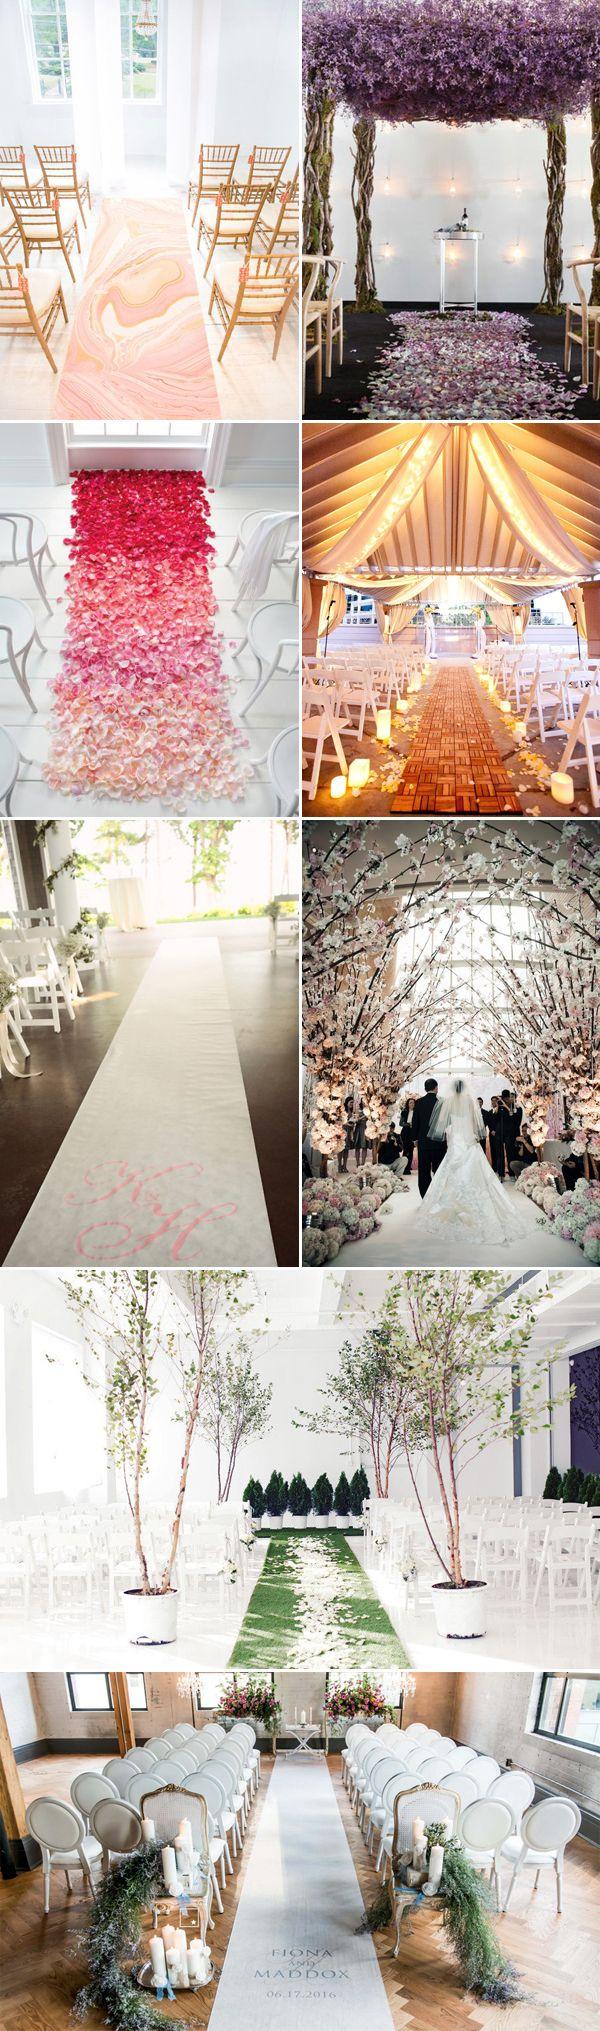 Wedding aisle decor ideas diy   Creative Wedding Aisle Runners  Wedding aisle runners Indoor